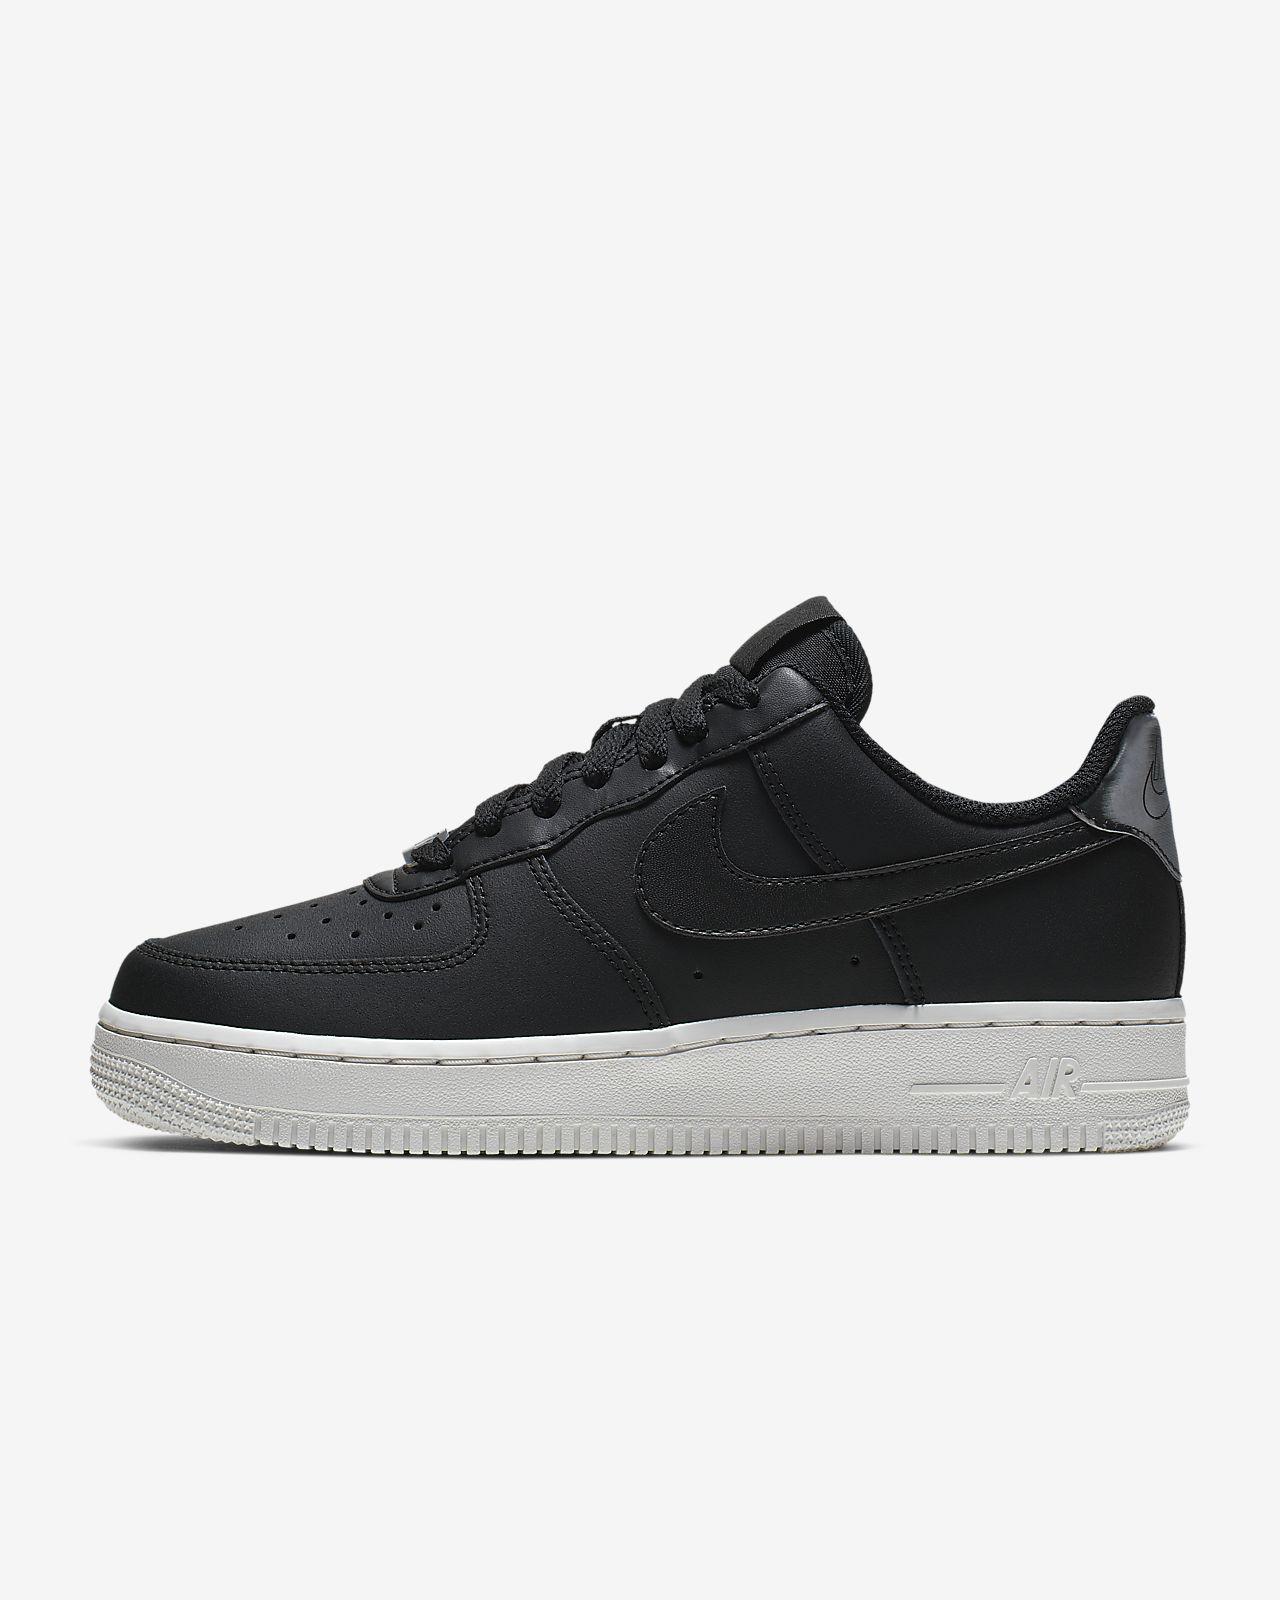 342275c9 Nike Air Force 1 '07 Essential sko til dame. Nike.com NO